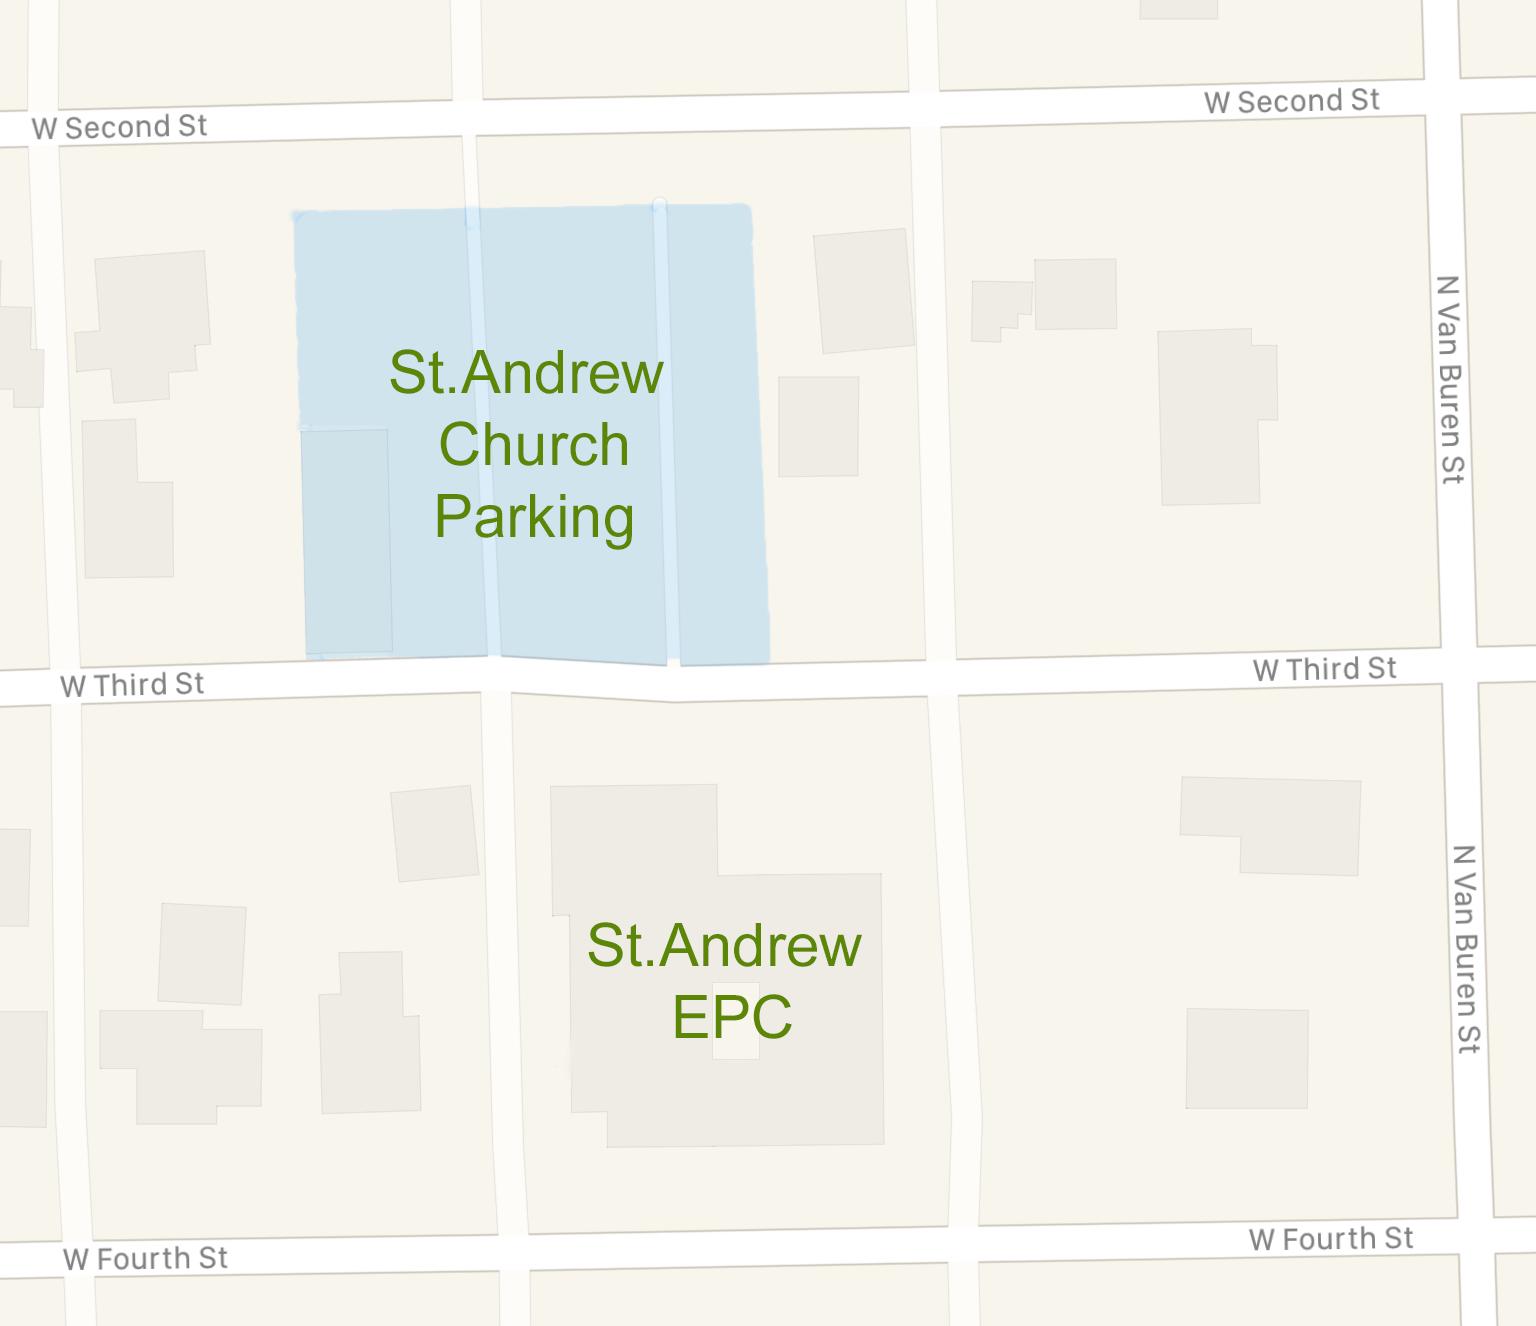 parking lot st andrew presbyterian church in auburn indiana